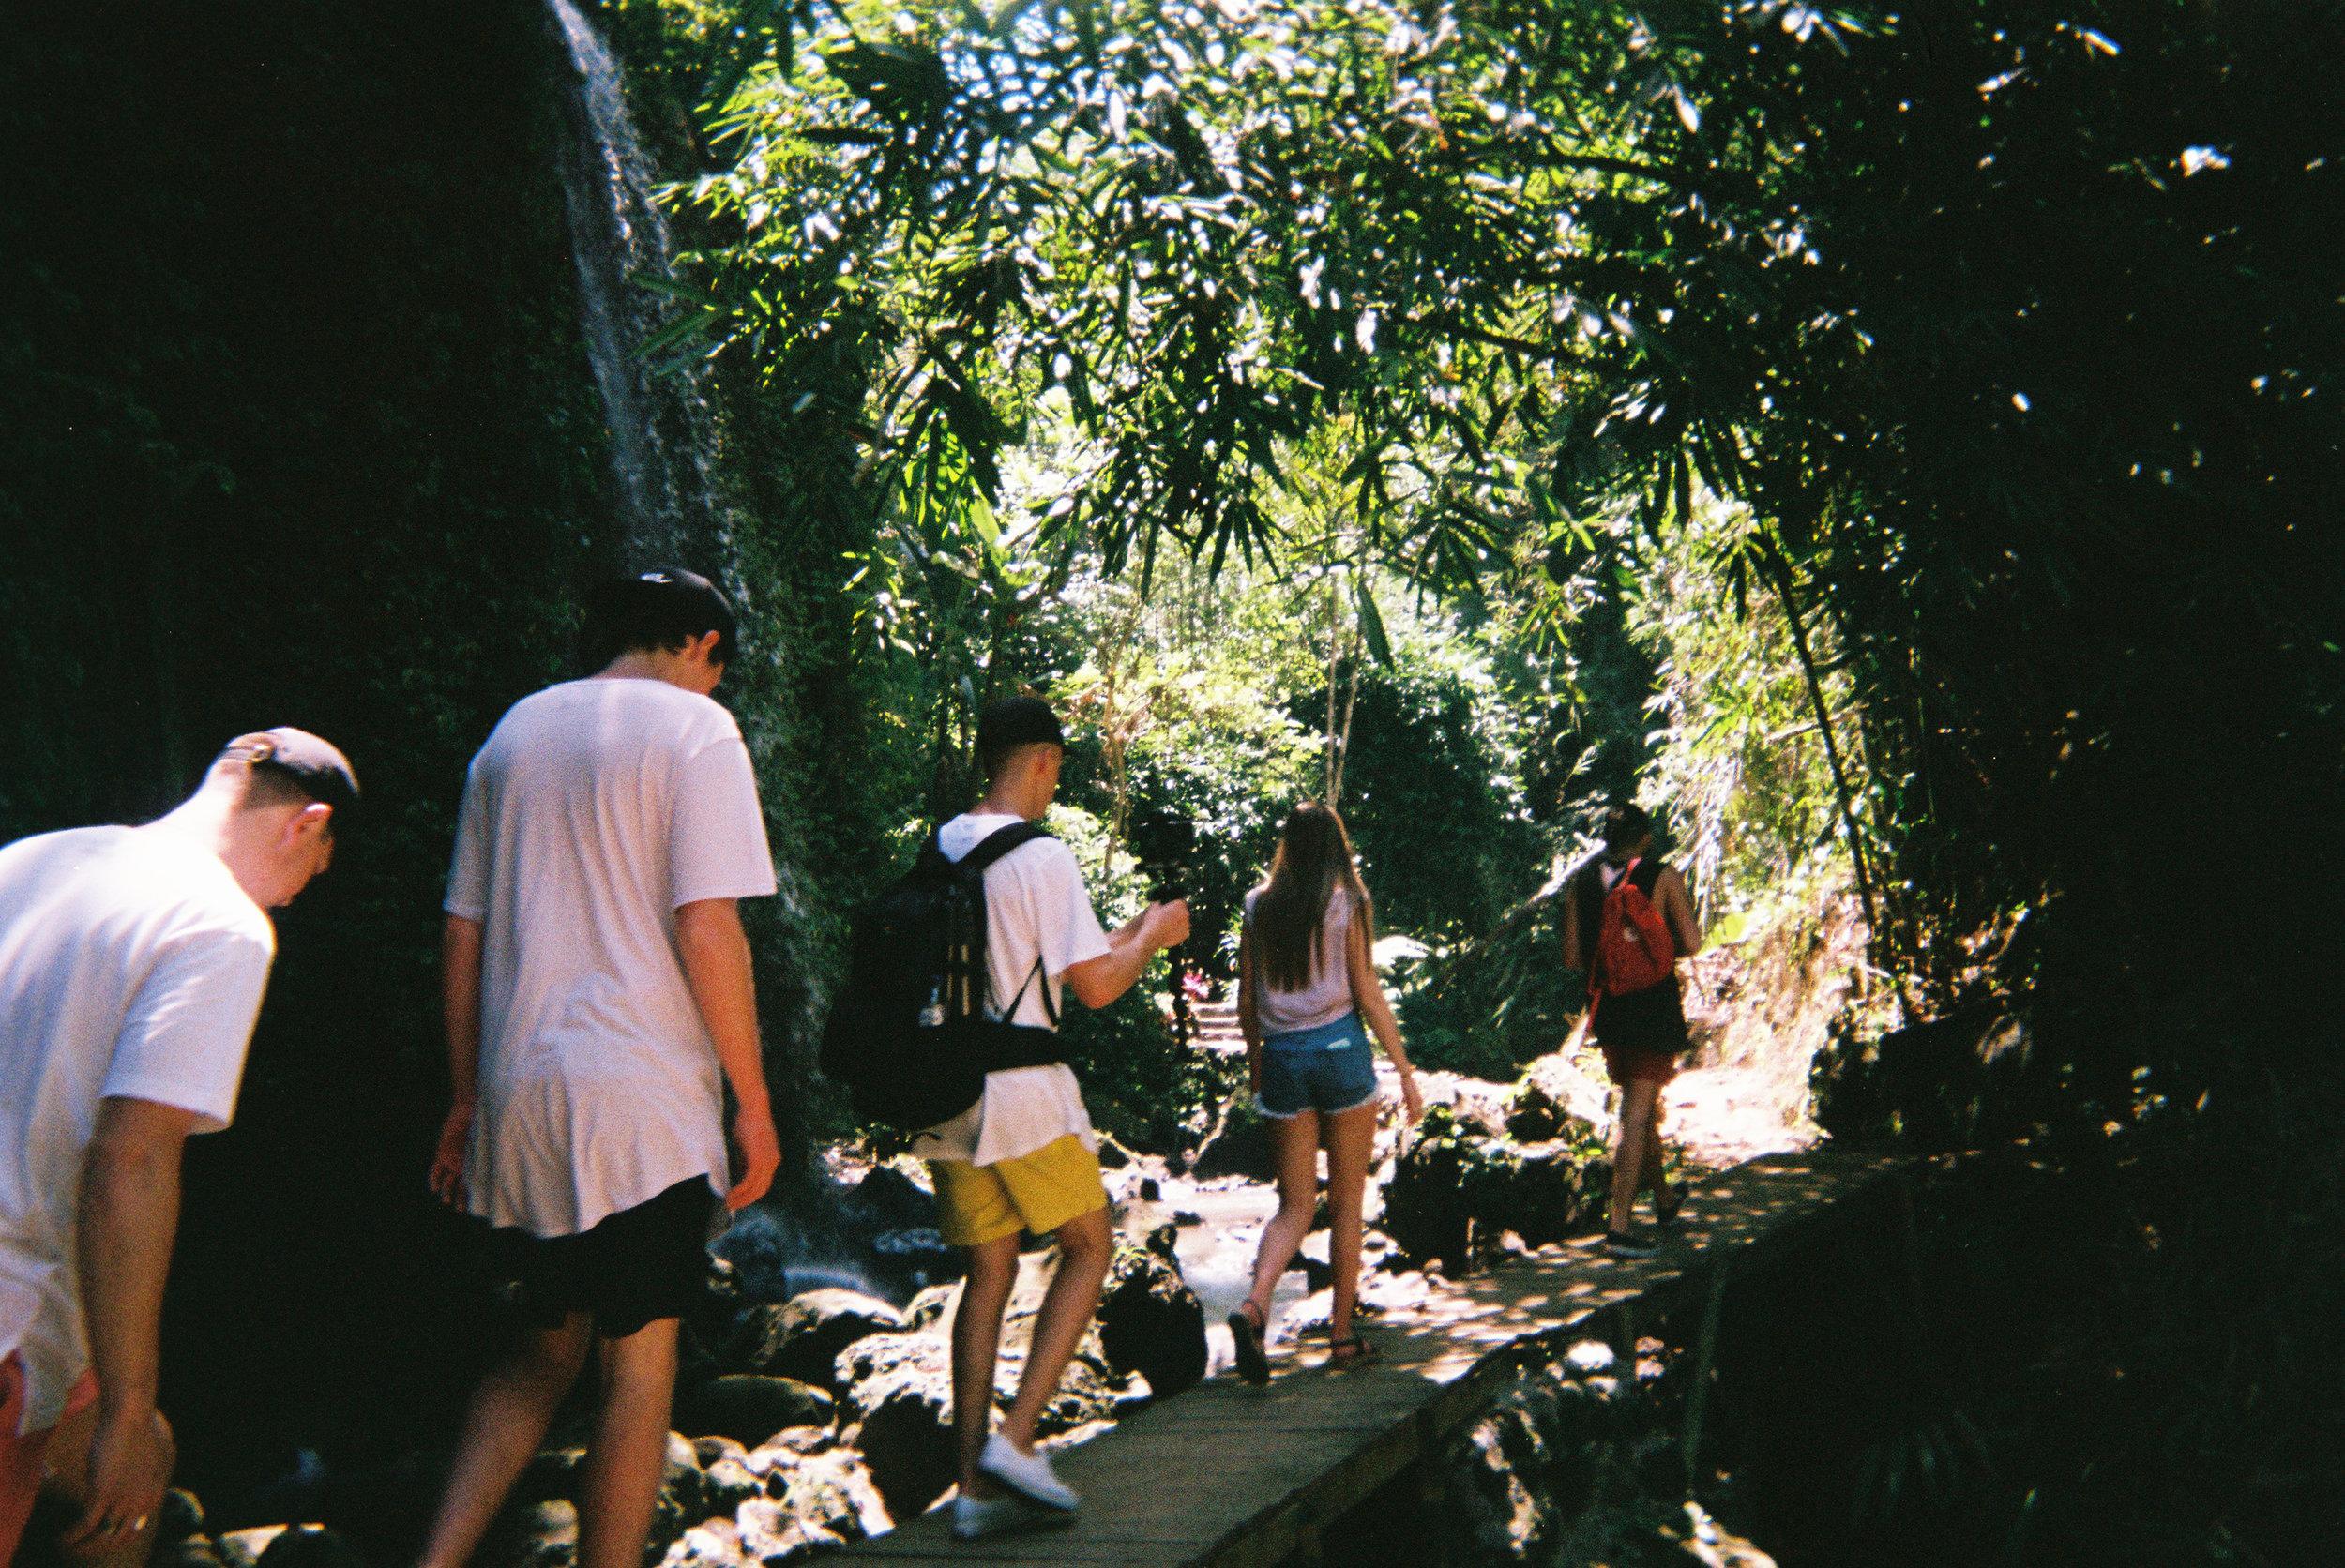 Hiking to the Tibumana waterfall. Peep jacksons camera set up hahaha the boy DOES. NOT. REST.